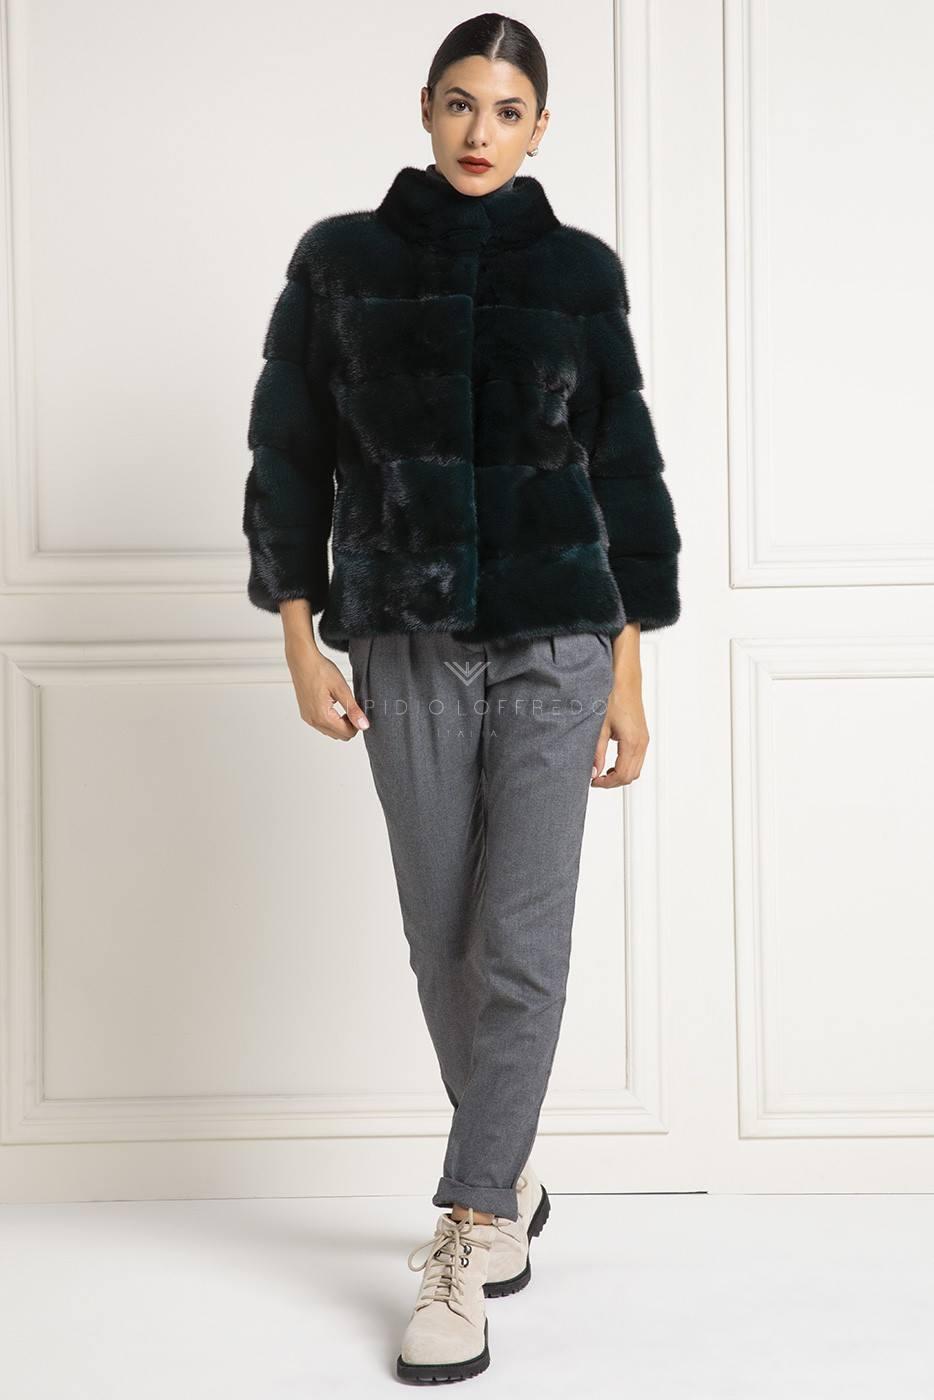 Dark Green Mink Fur Jacket - Length 65 cm